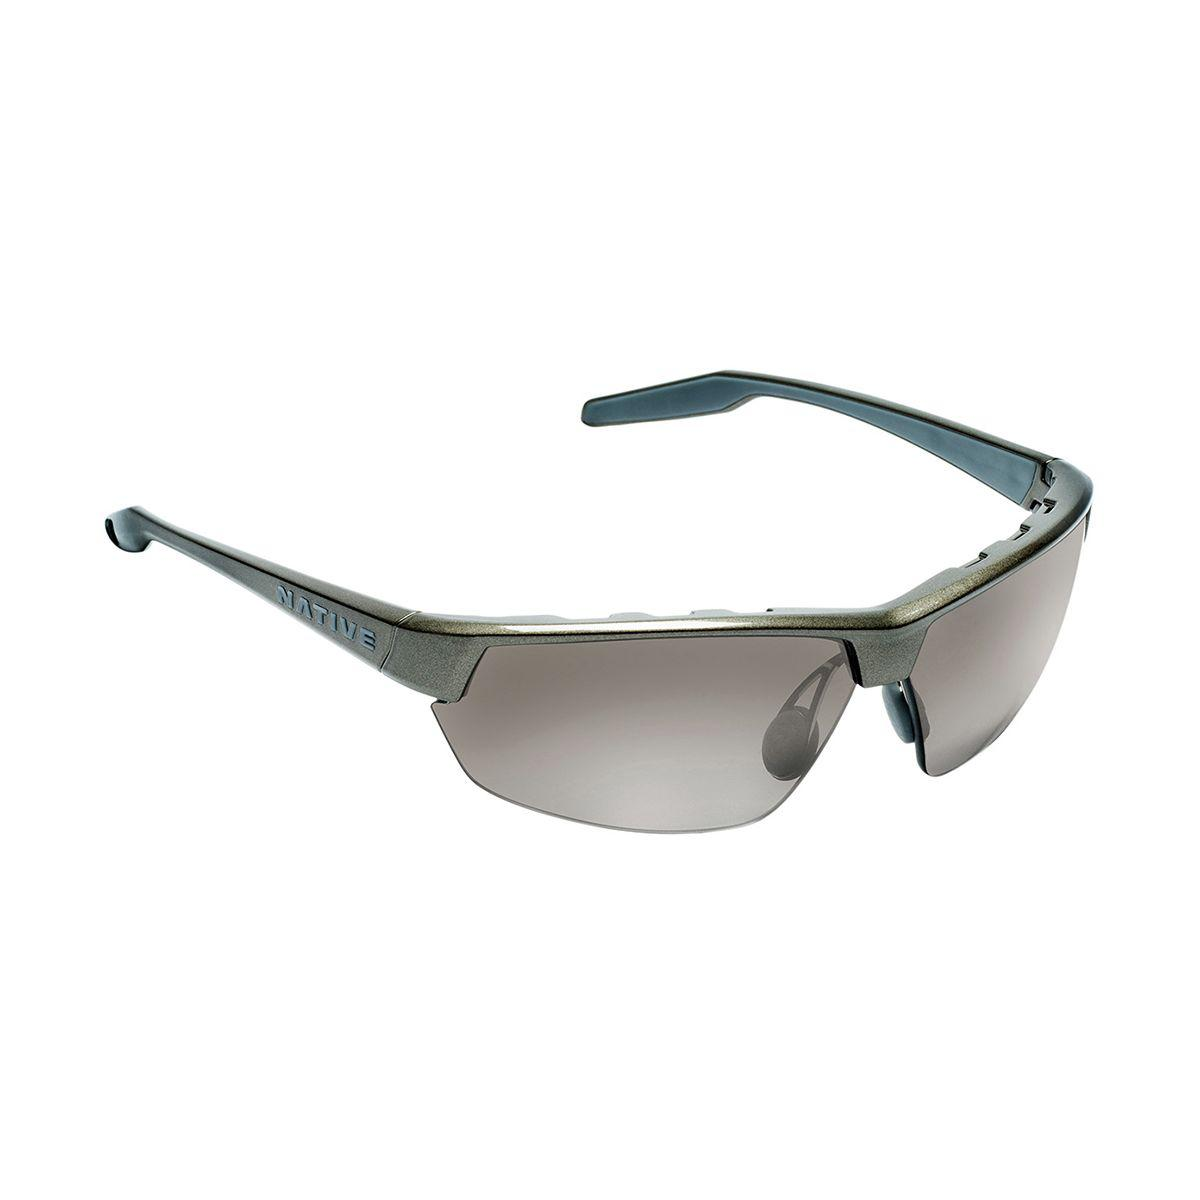 51ce7561d7 Native Eyewear. Men s Metallic Hardtop Ultra Interchangeable Sunglasses -  Polarized